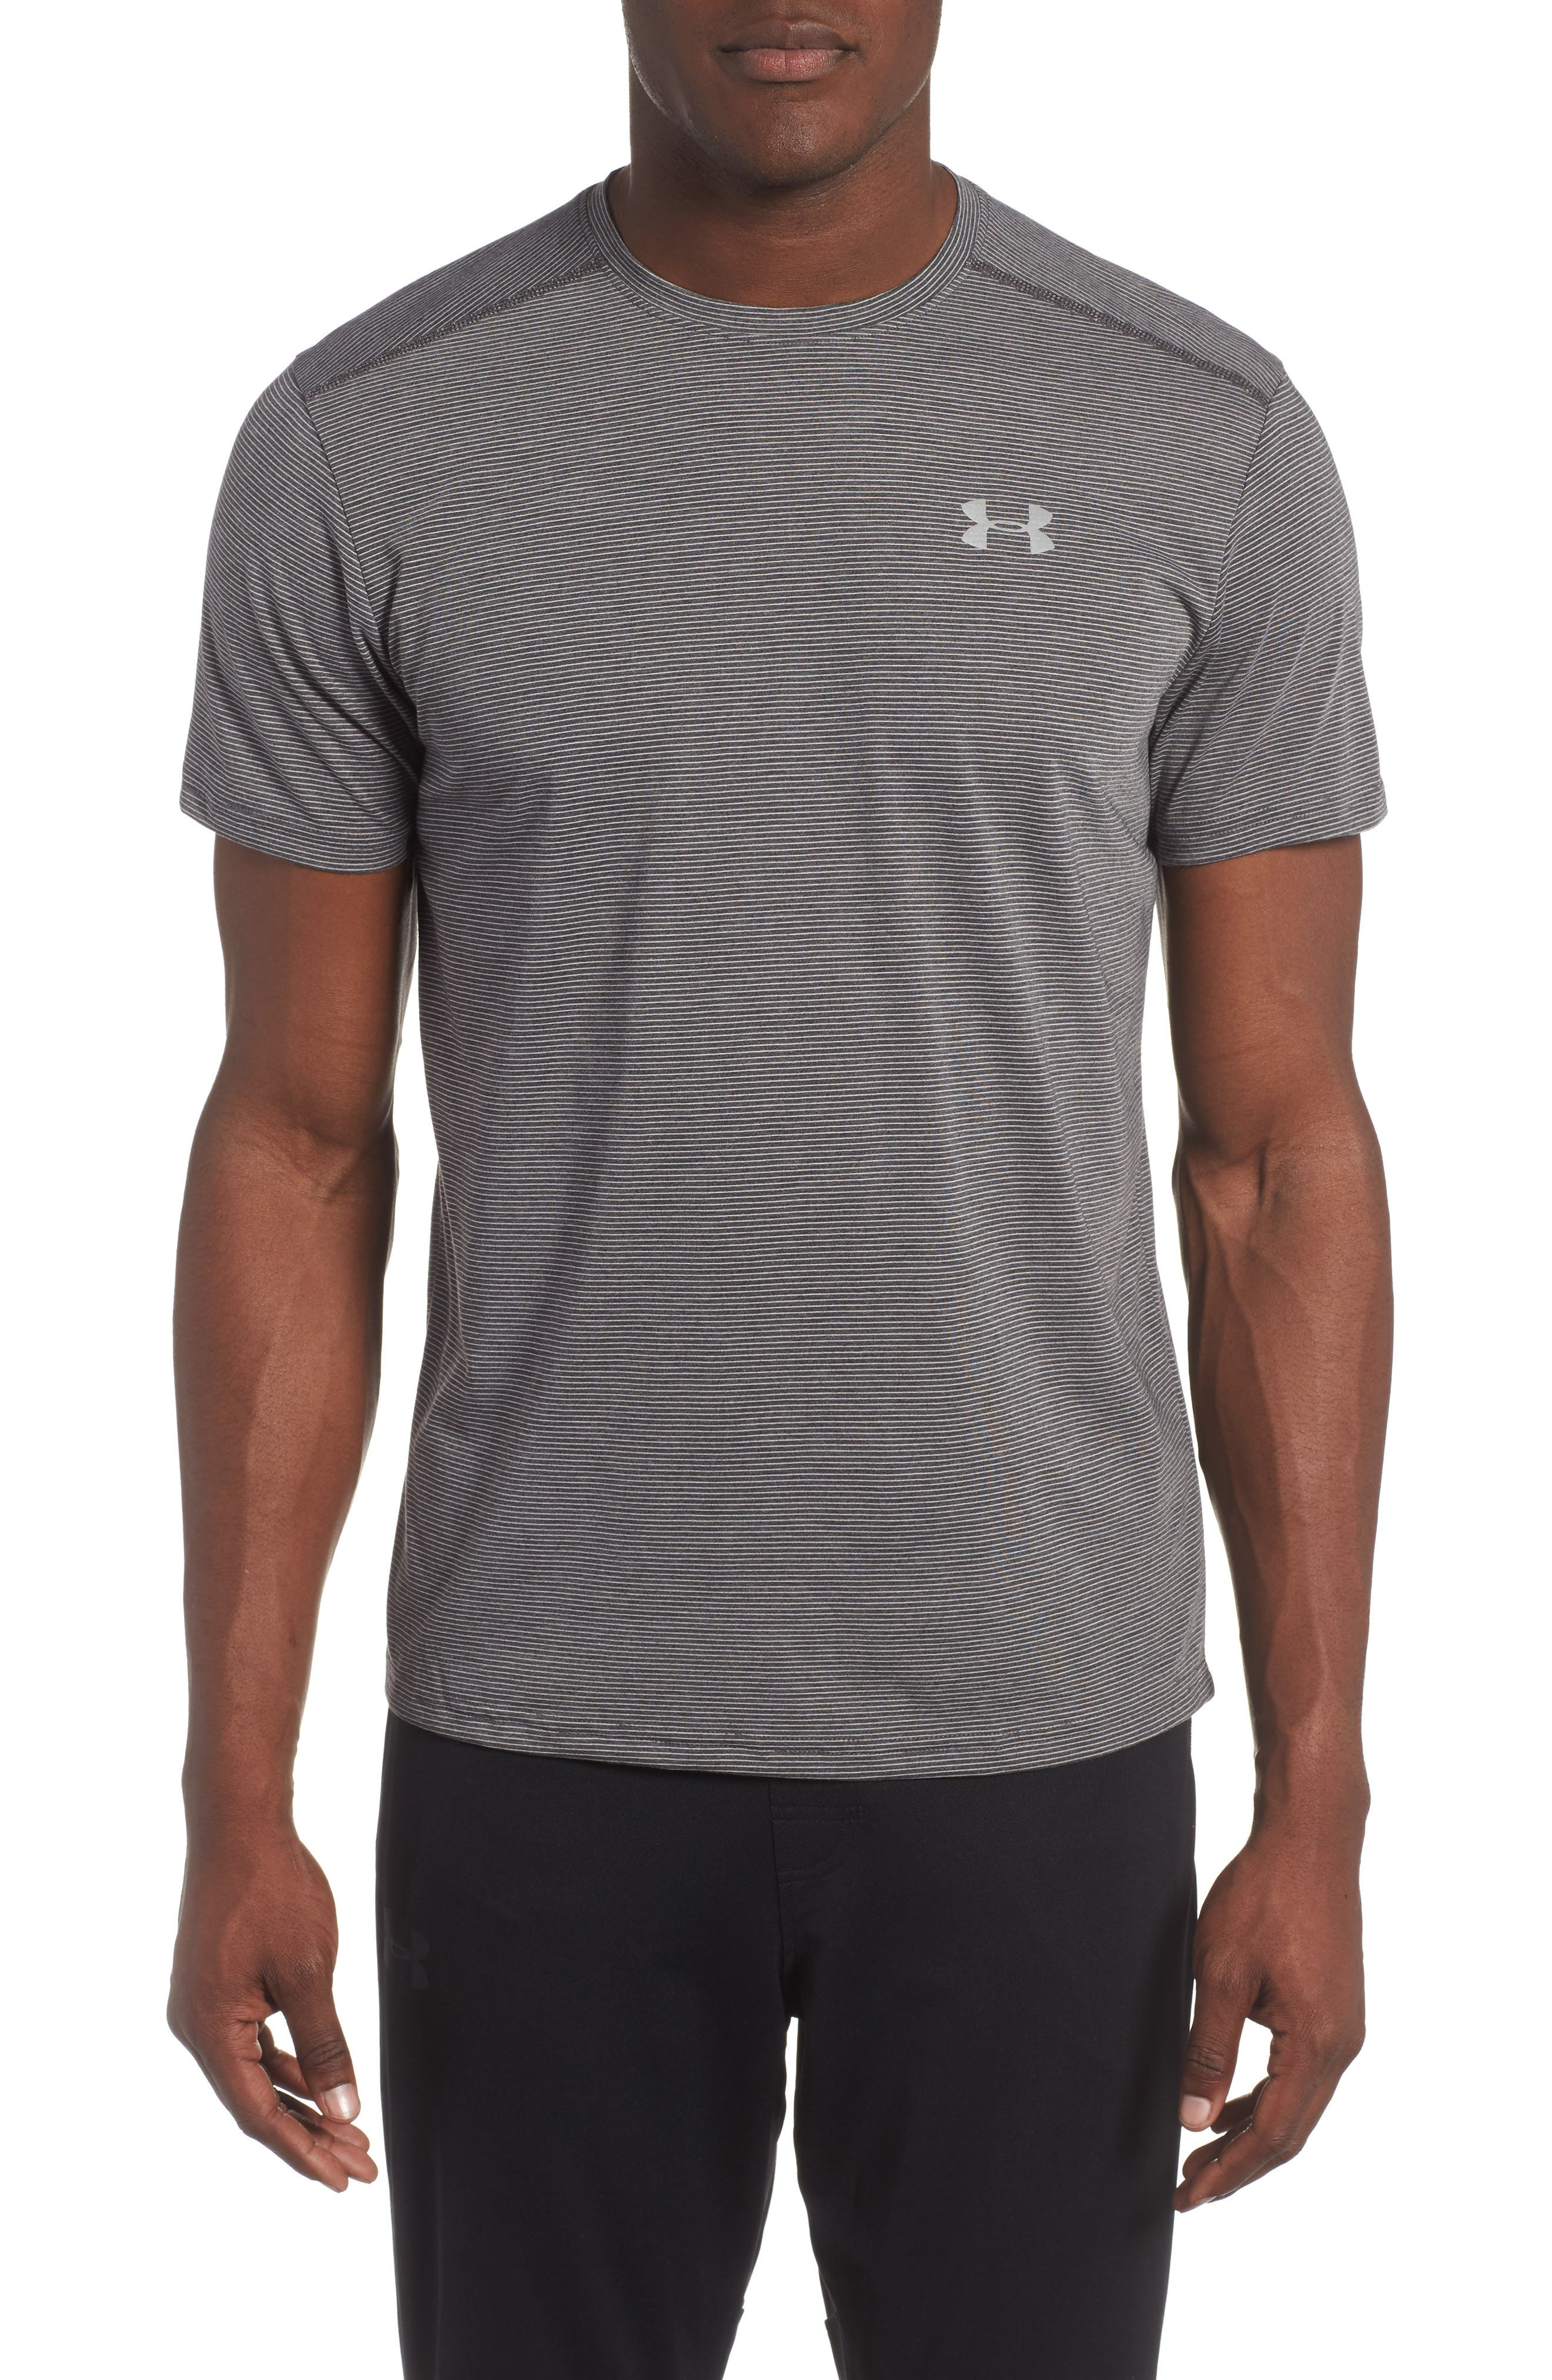 Under Armour 'Streaker Run' Microthread T-Shirt